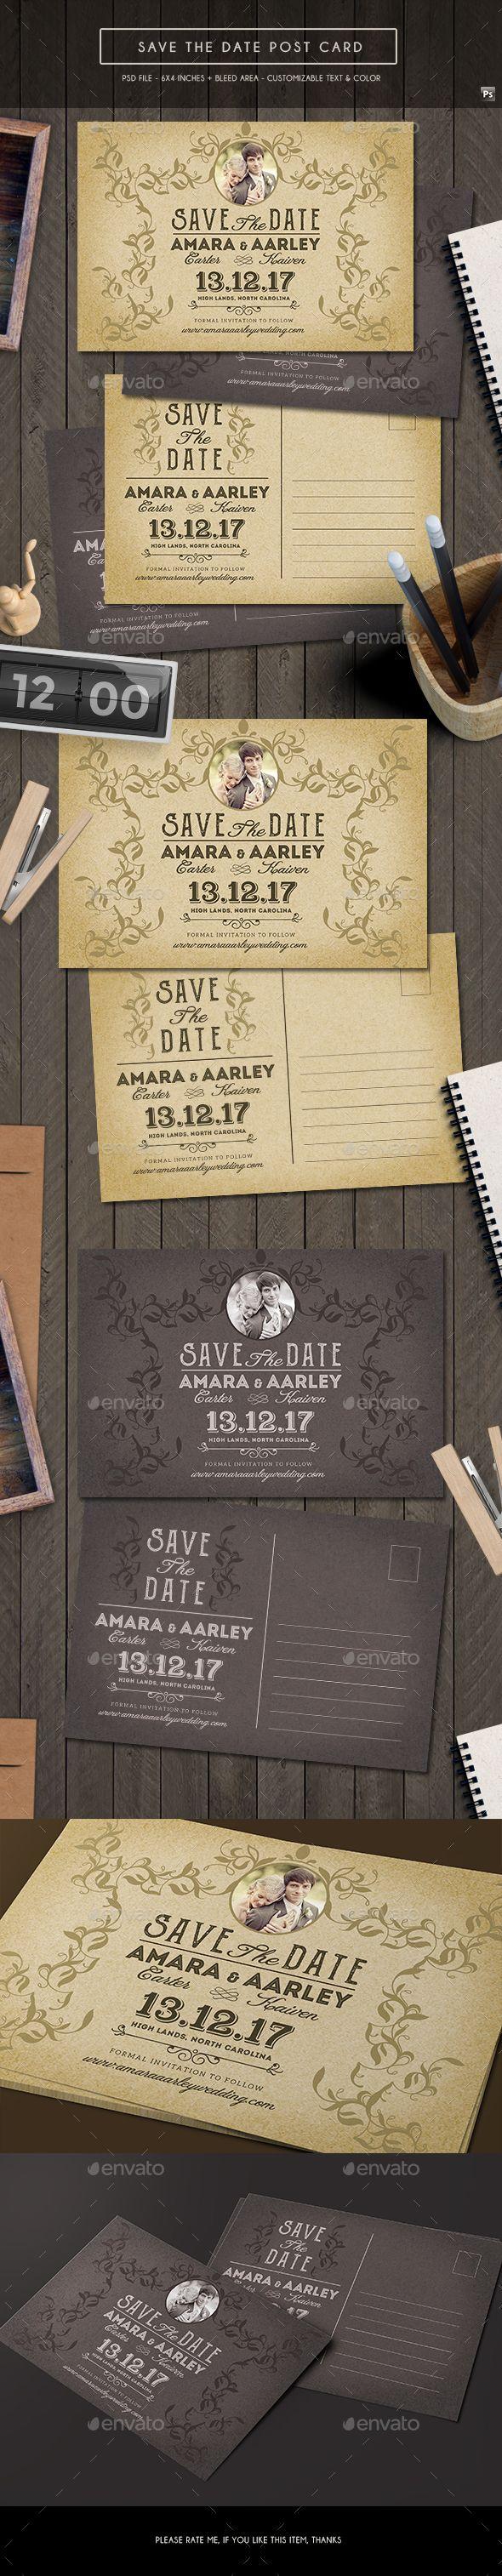 wedding invitation design psd%0A Vintage Save the Date Post Card